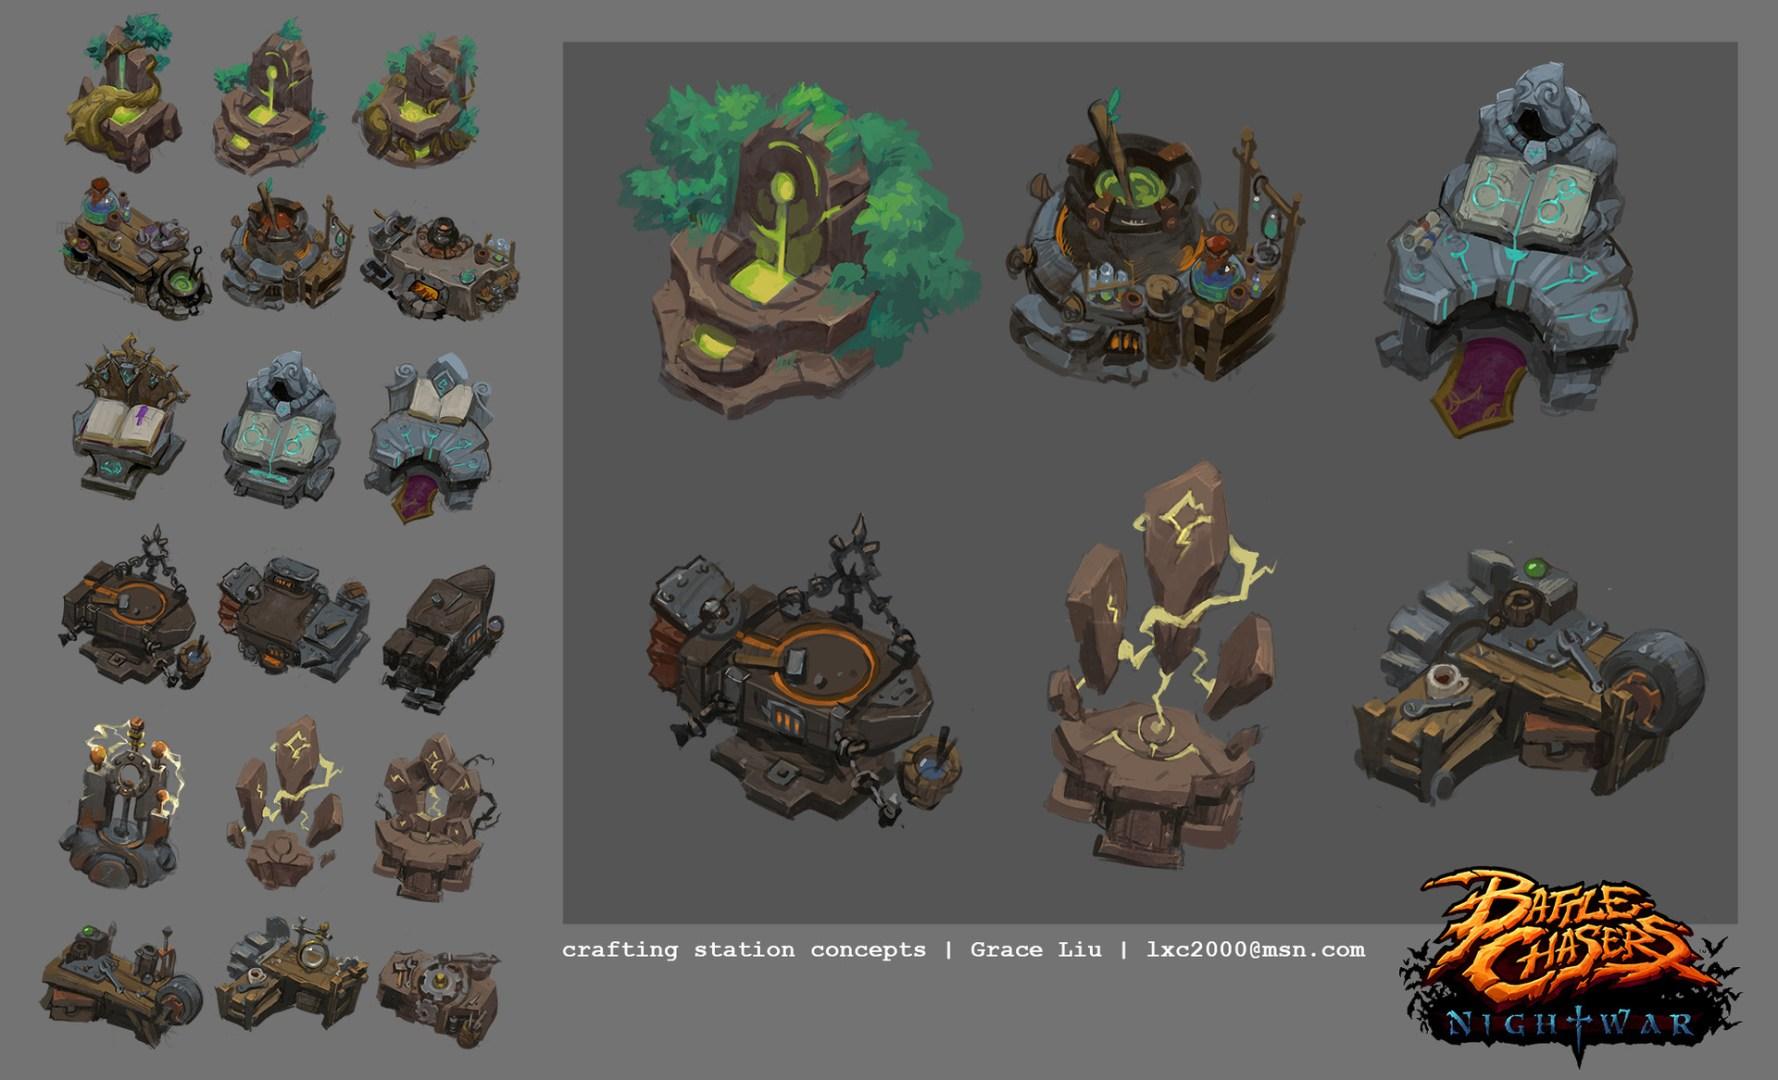 Quelle: artstation - Grace Liu - Battle Chasers: Nightwar (bc-crafting-station-concept-01)